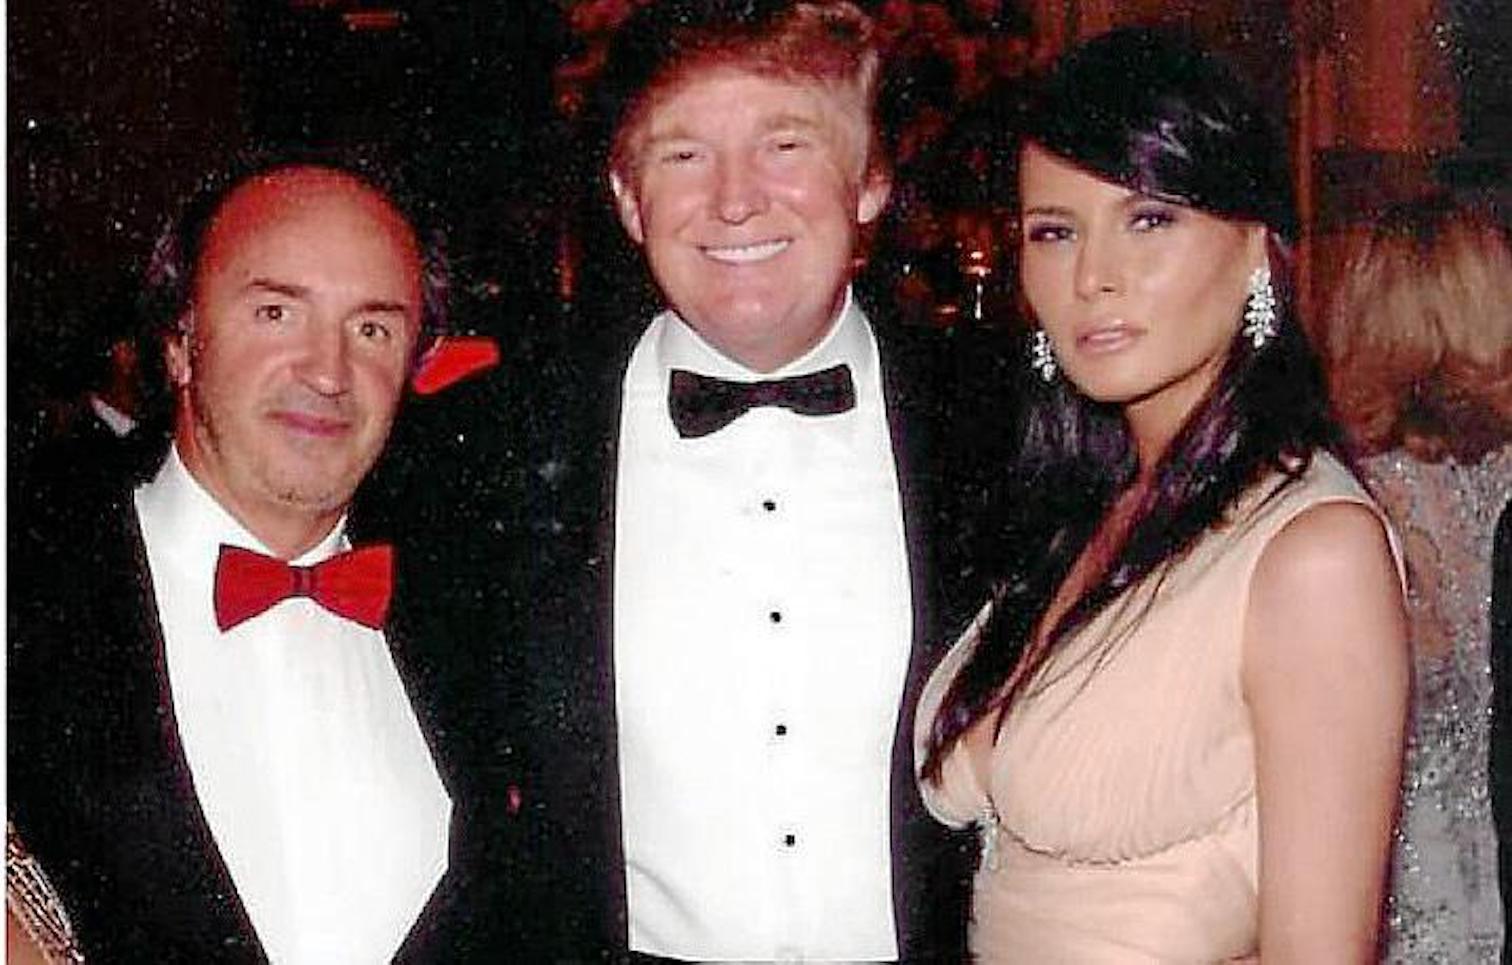 George Lombardi with Former US President, Donald Trump & wife Melanie.